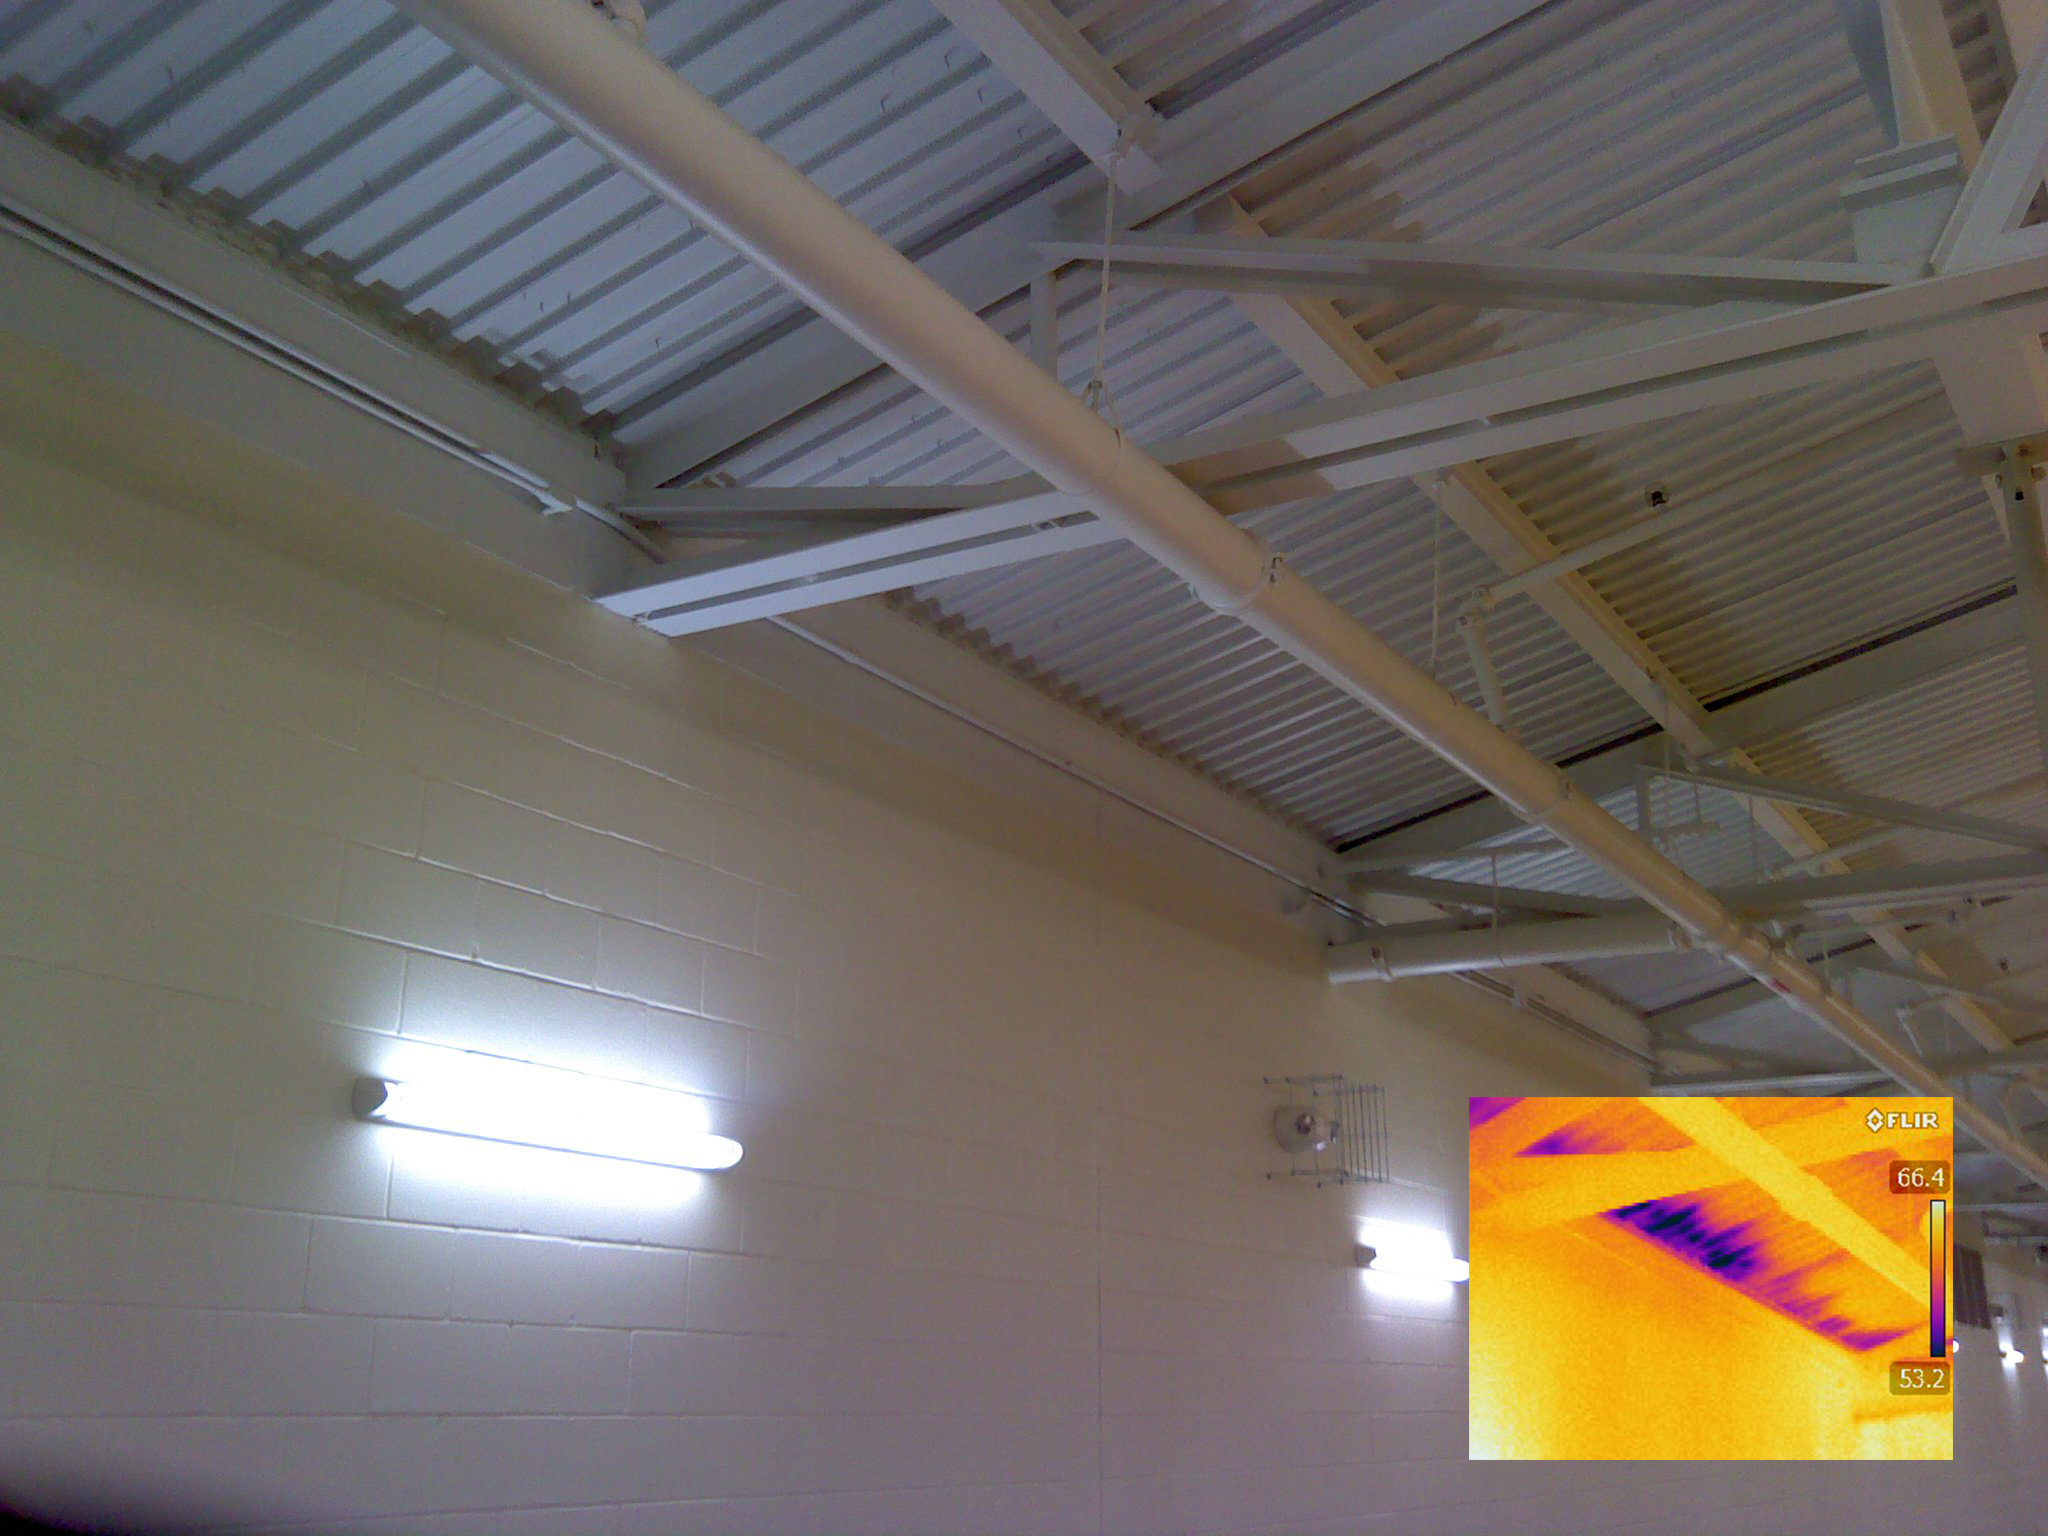 Ft. Sill Physical Fitness Facility, Ft. Sill, Oklahoma